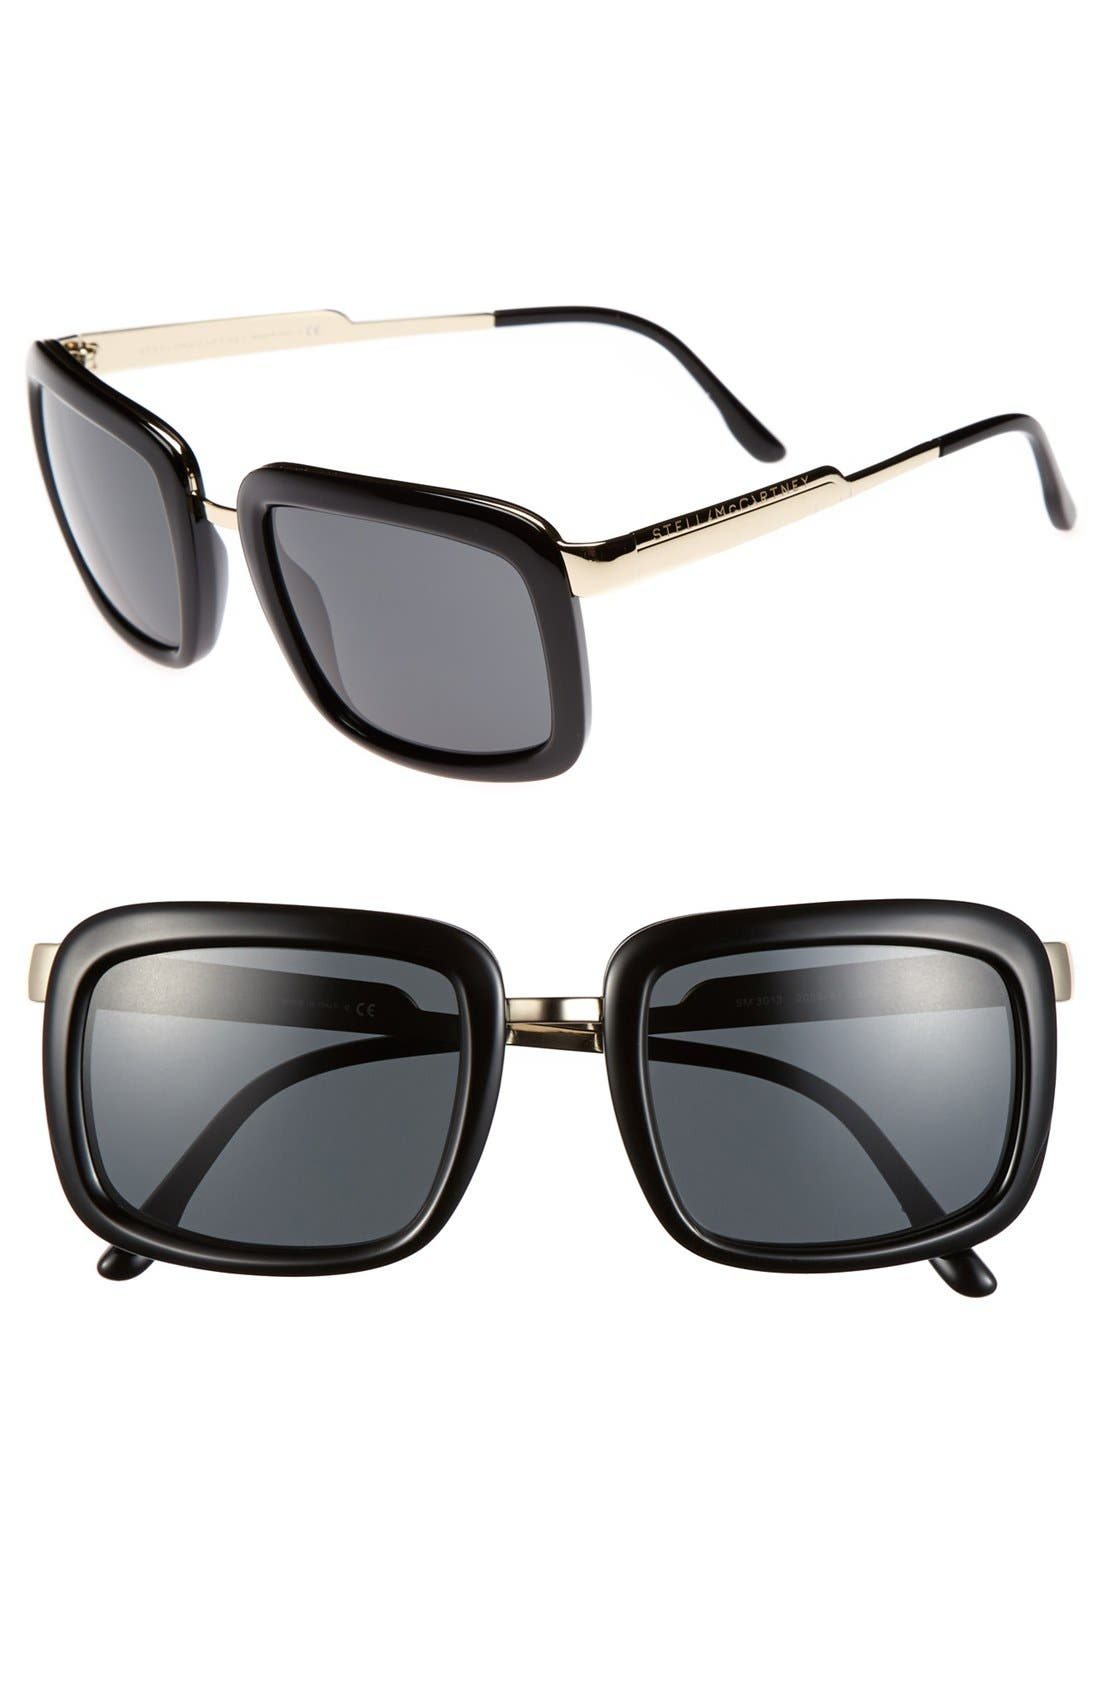 Main Image - Stella McCartney 52mm Retro Sunglasses